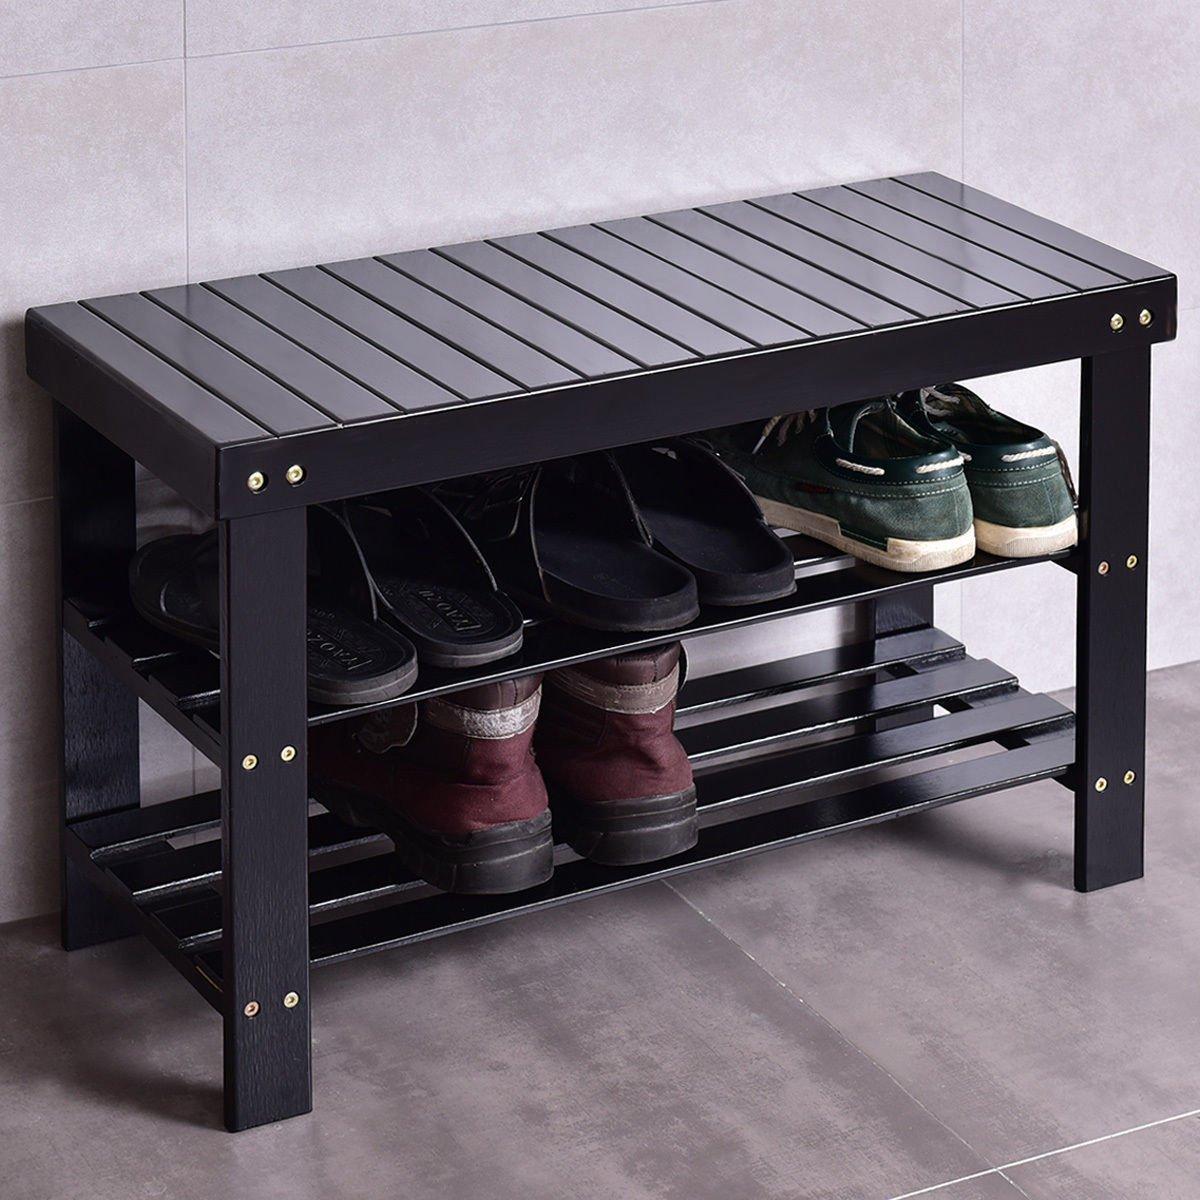 COSTWAY Bamboo Shoe Rack Bench 3-Tier Free Standing Wood Shoe Storage Organizer Shelf Holder Home Entryway Hallway Furniture Eco-Friendly (Black)